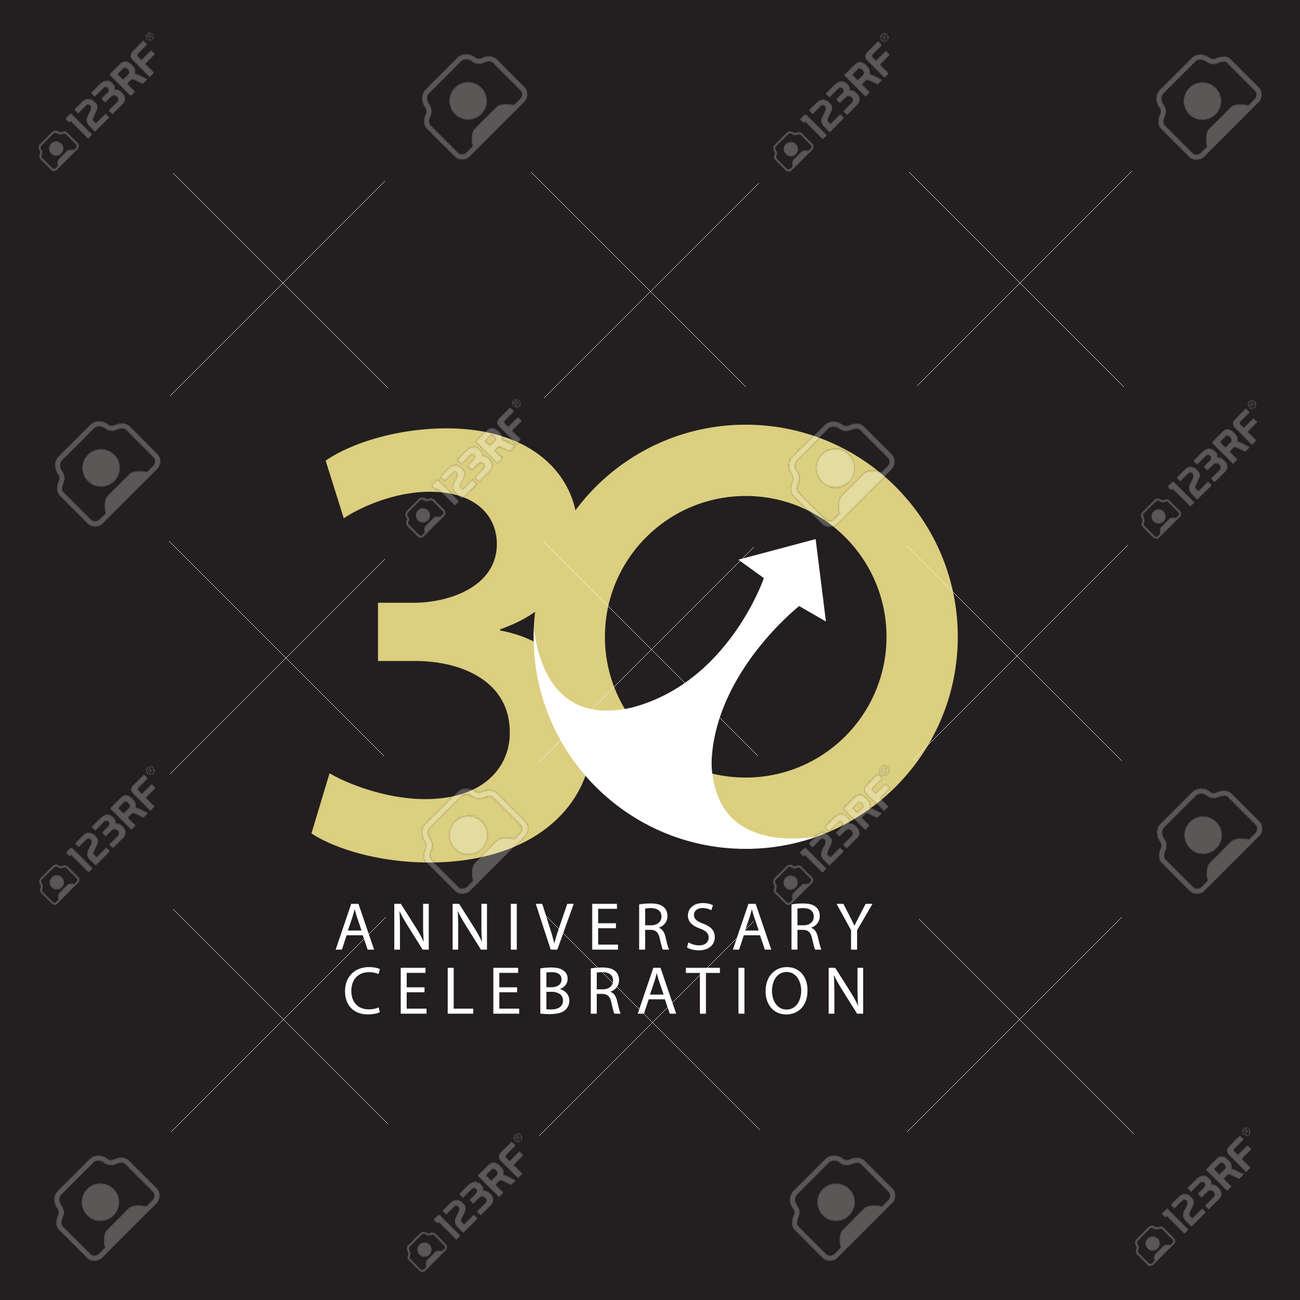 30 Years Anniversary Celebration Vector Template Design Illustration - 163698085